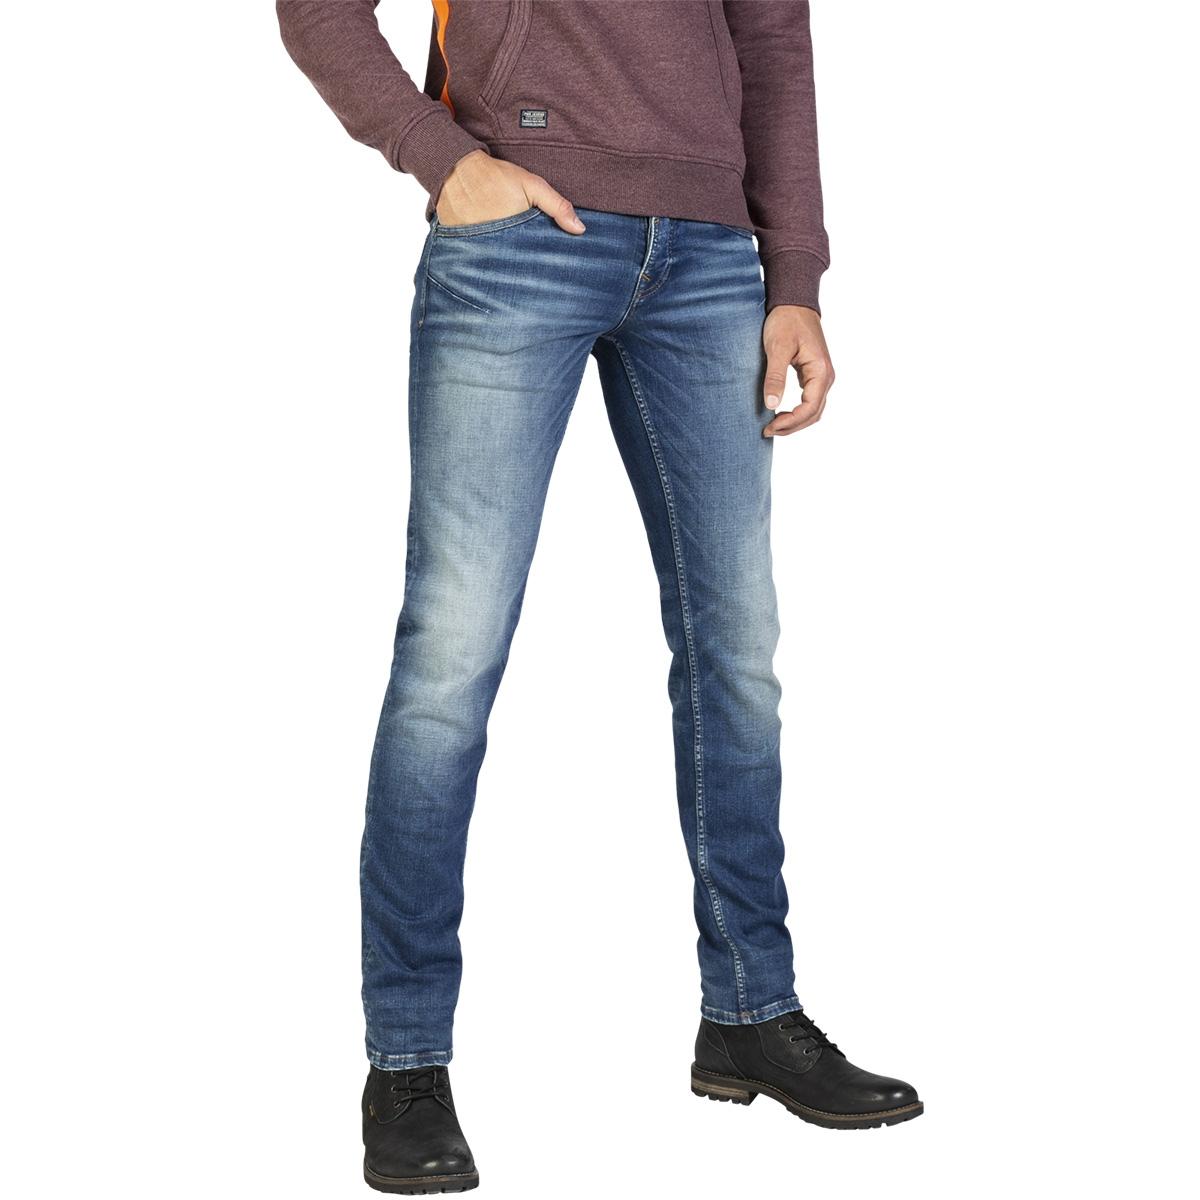 skyhawk ptr170 pme legend jeans new mid stone